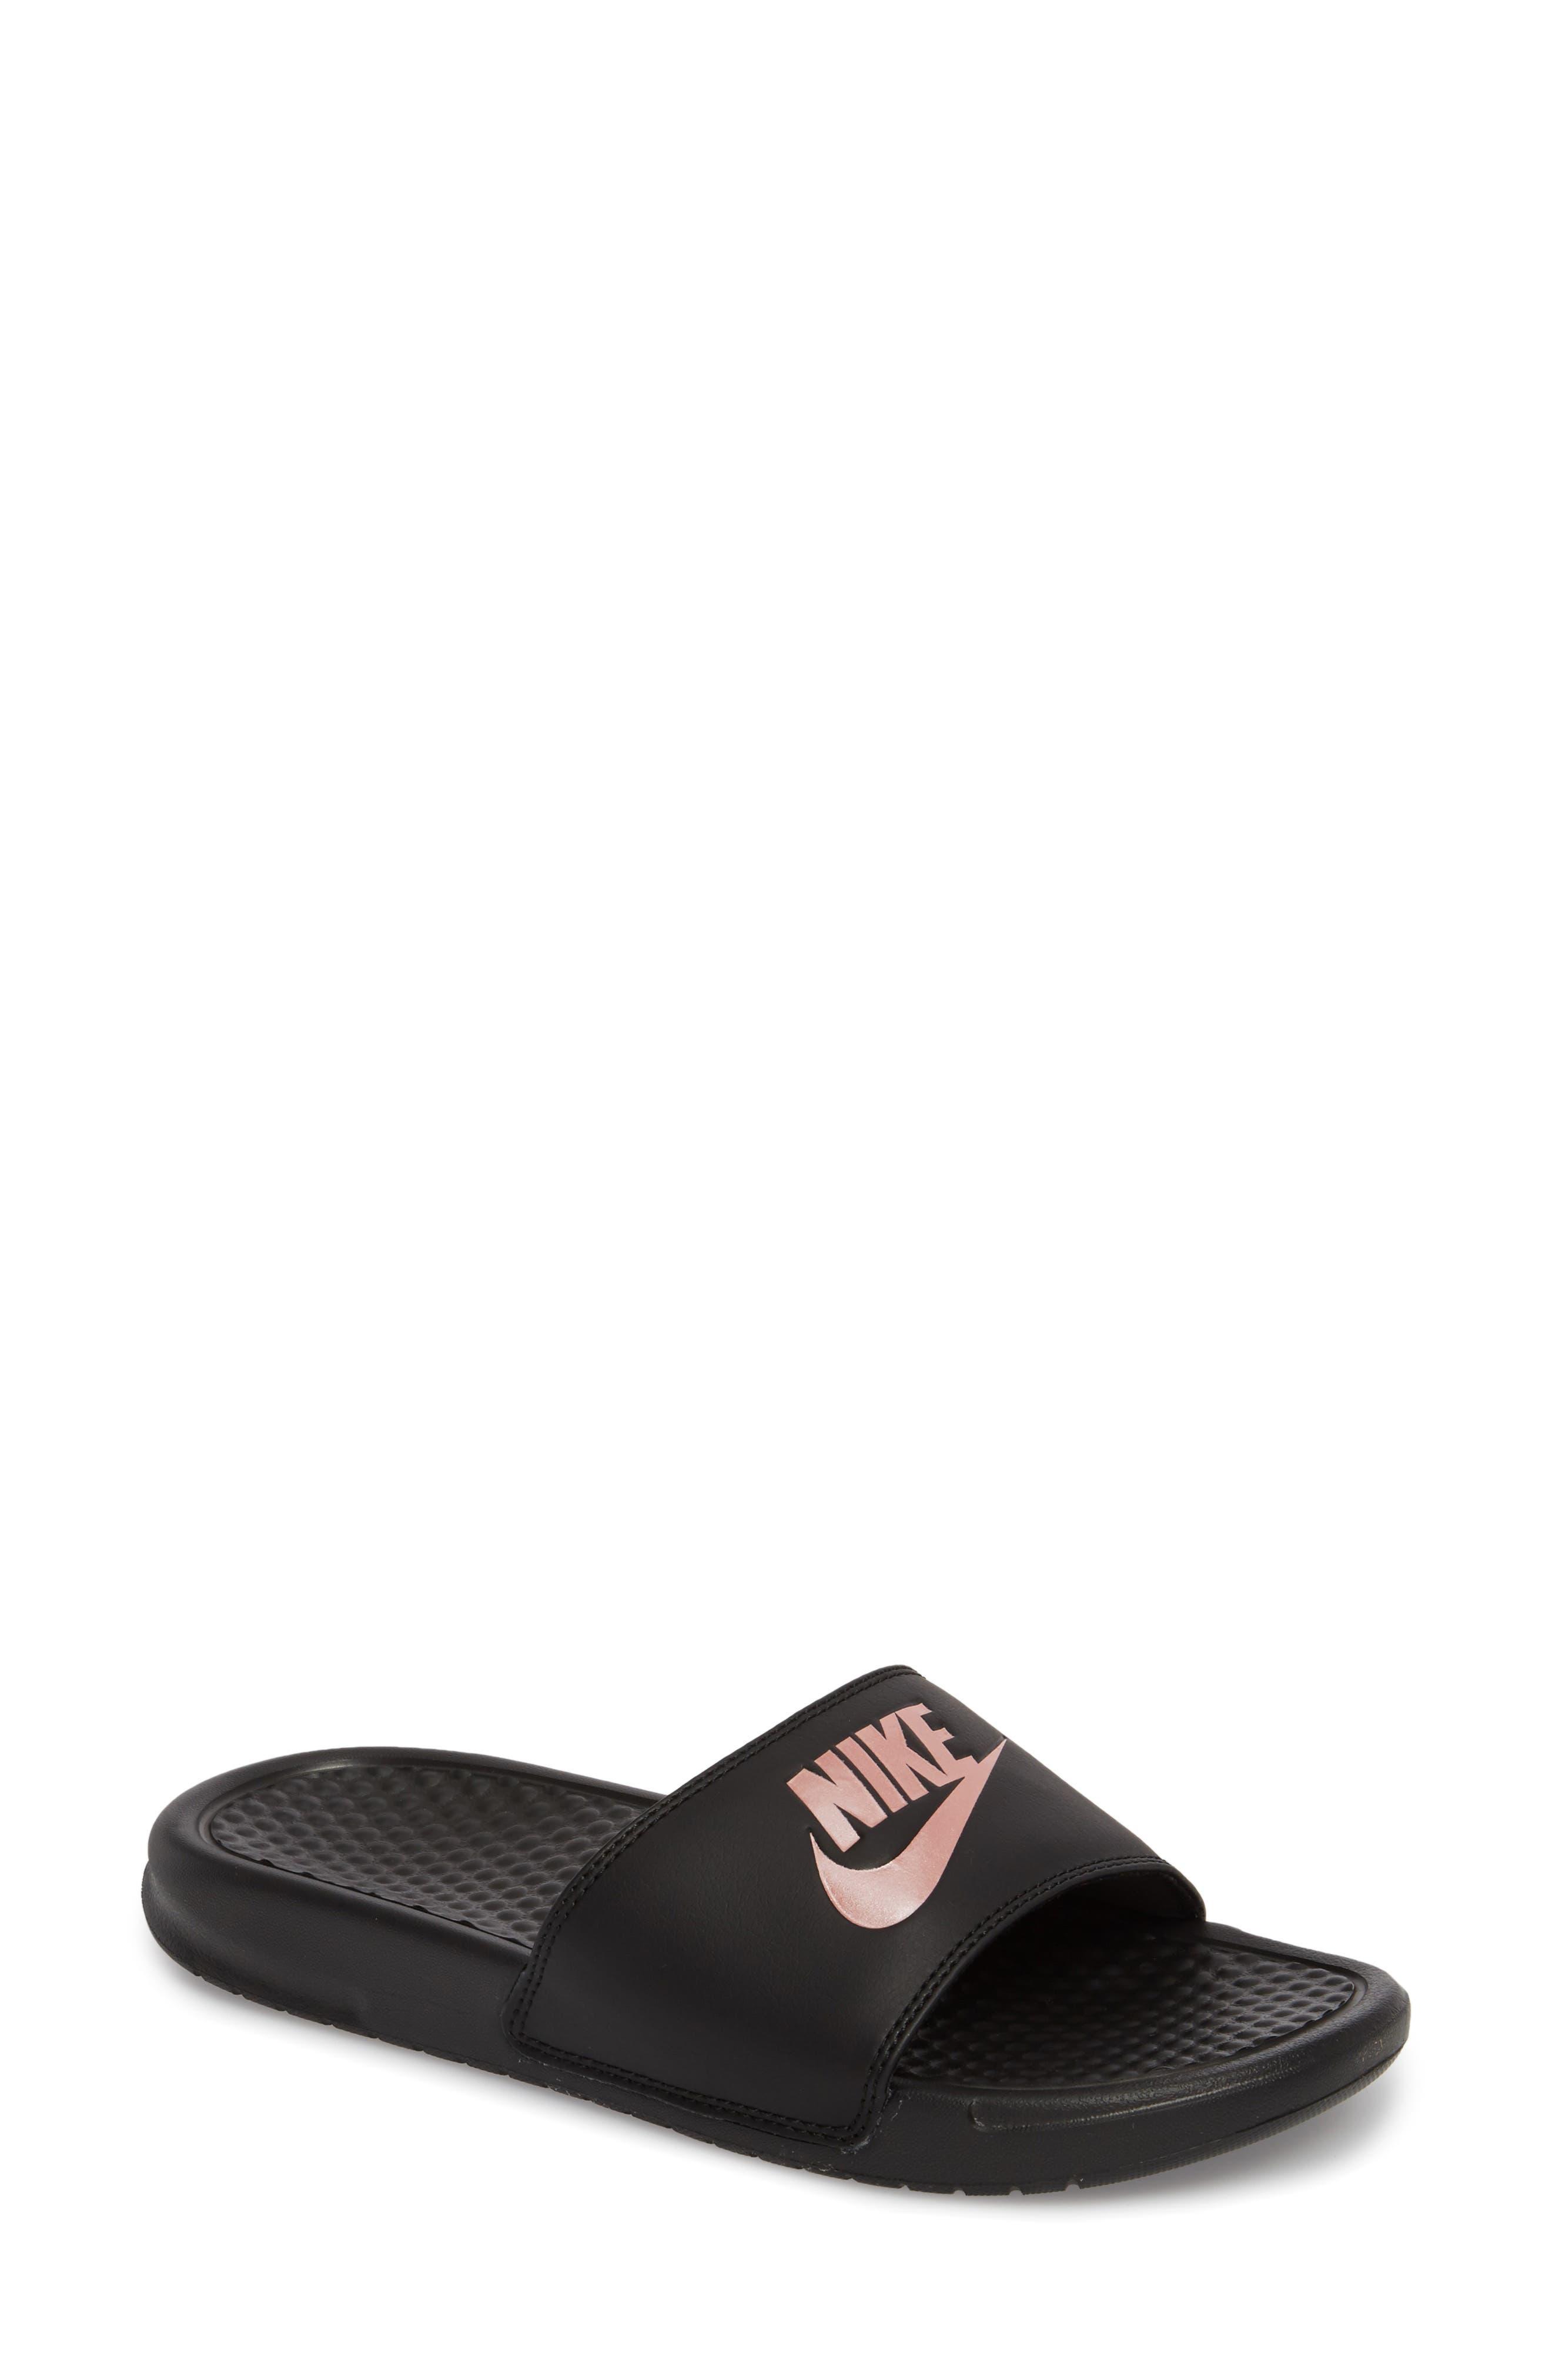 Benassi JDI Slide Sandal,                         Main,                         color,